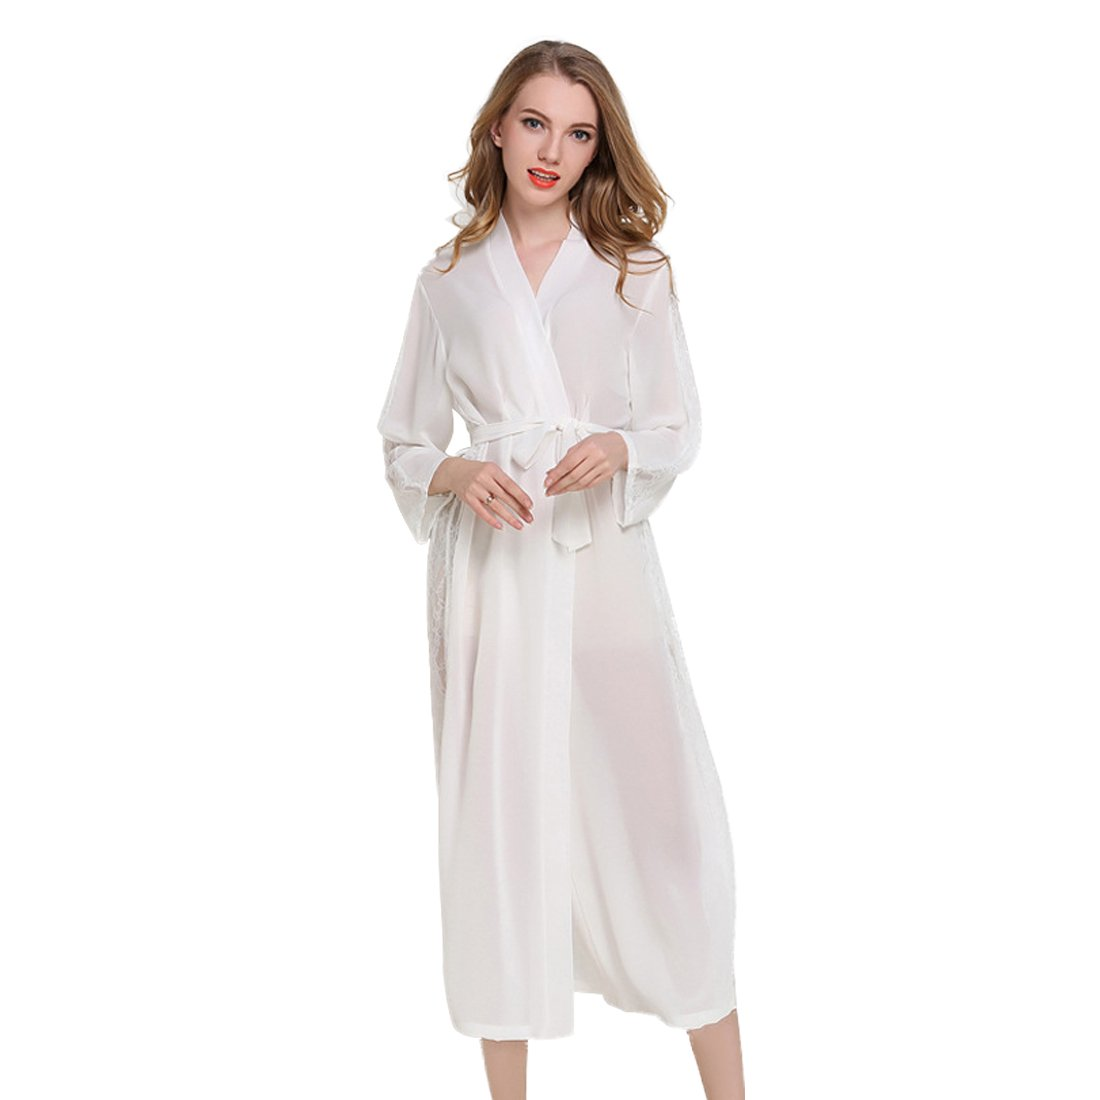 52aba8b0bb JZLPIN Womens Sexy Chiffon Long Kimono Robes - Lightweight Long Sleeve  Bathrobe Lace Trim Sleepwear Black at Amazon Women s Clothing store